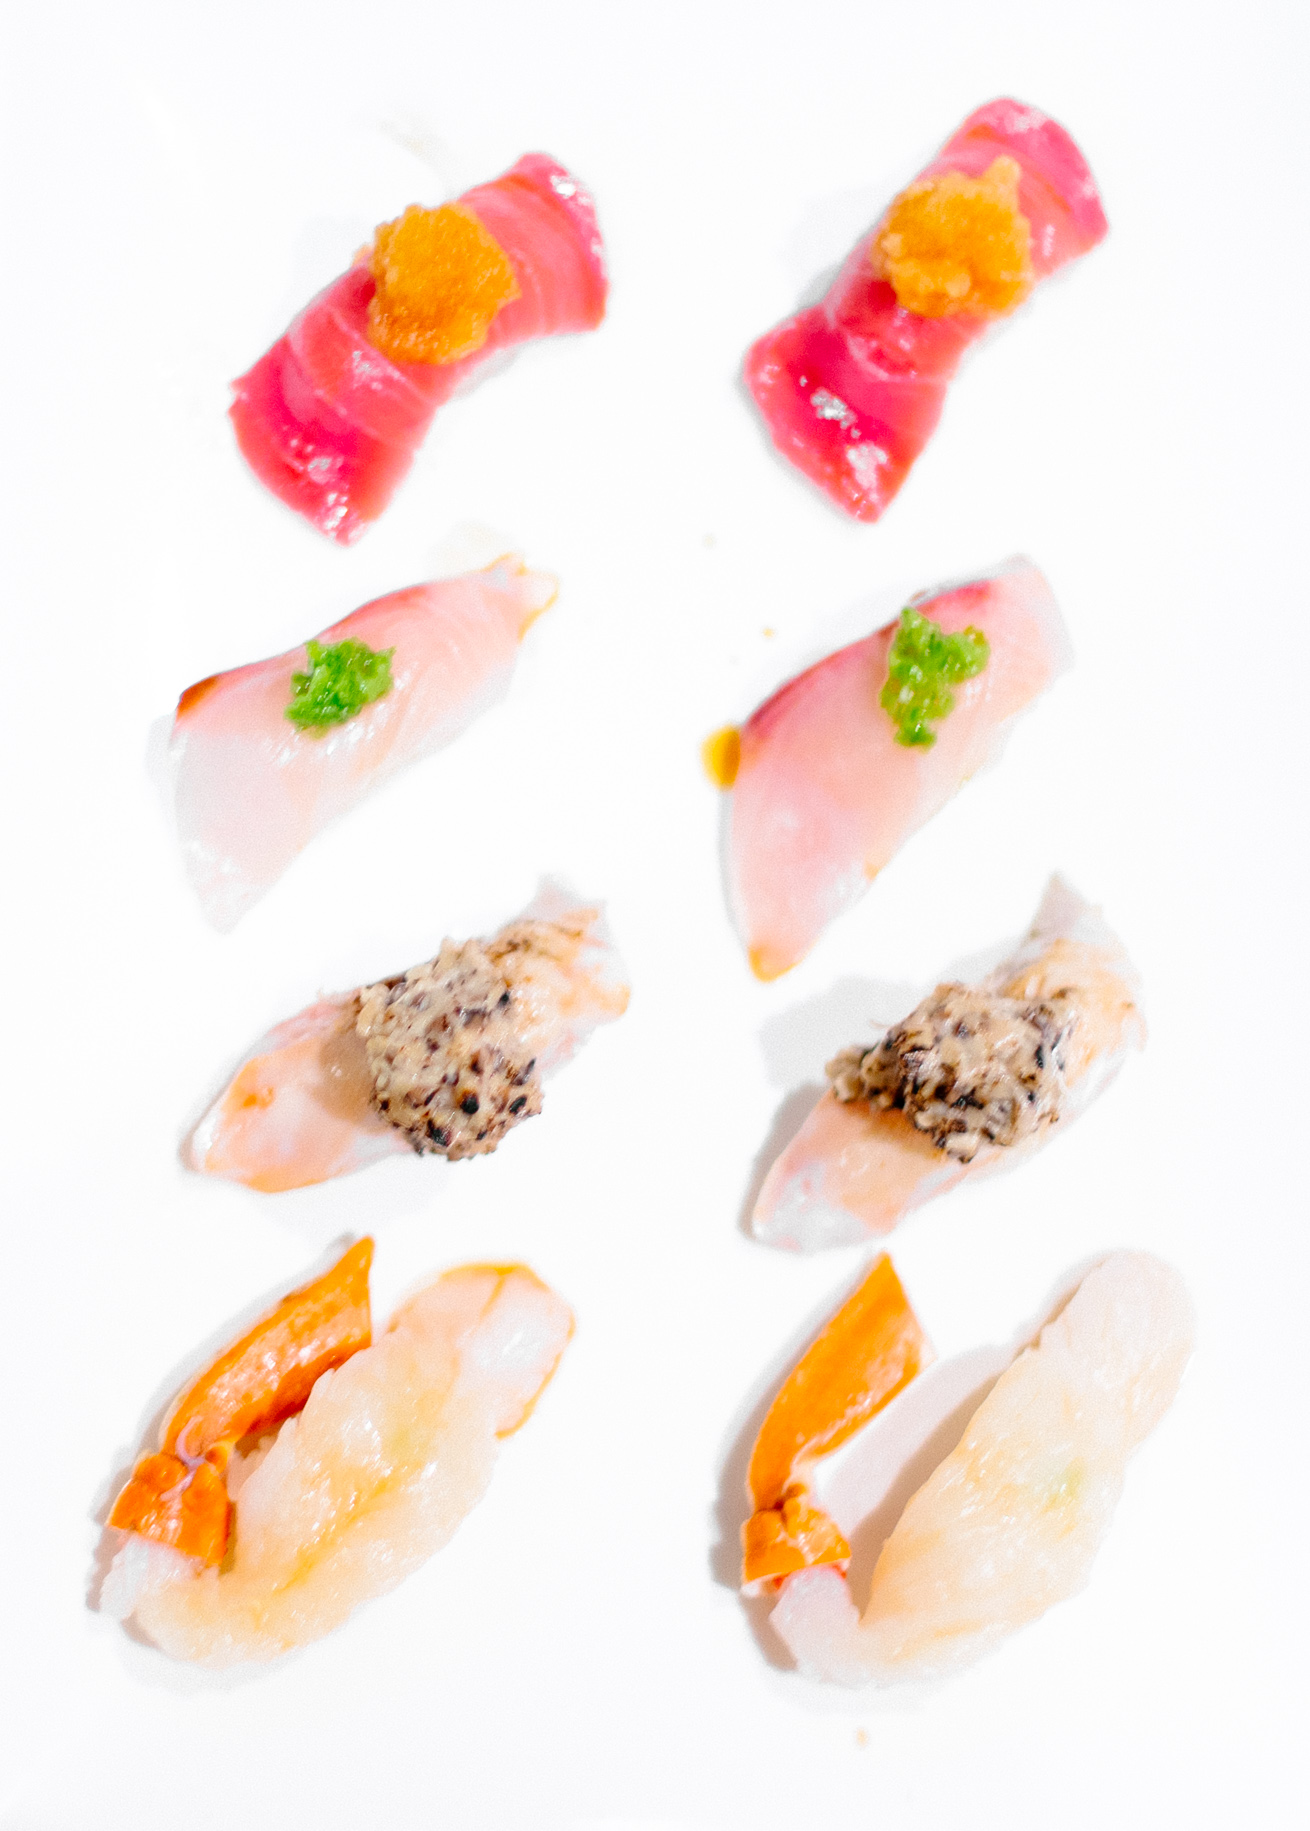 Bottom to top:   Snow Crab / Sautéed Kingfish  with creamy mushroom  / Baby Yellowtail  with jalapeño  / Toro  with ponzu soaked radish